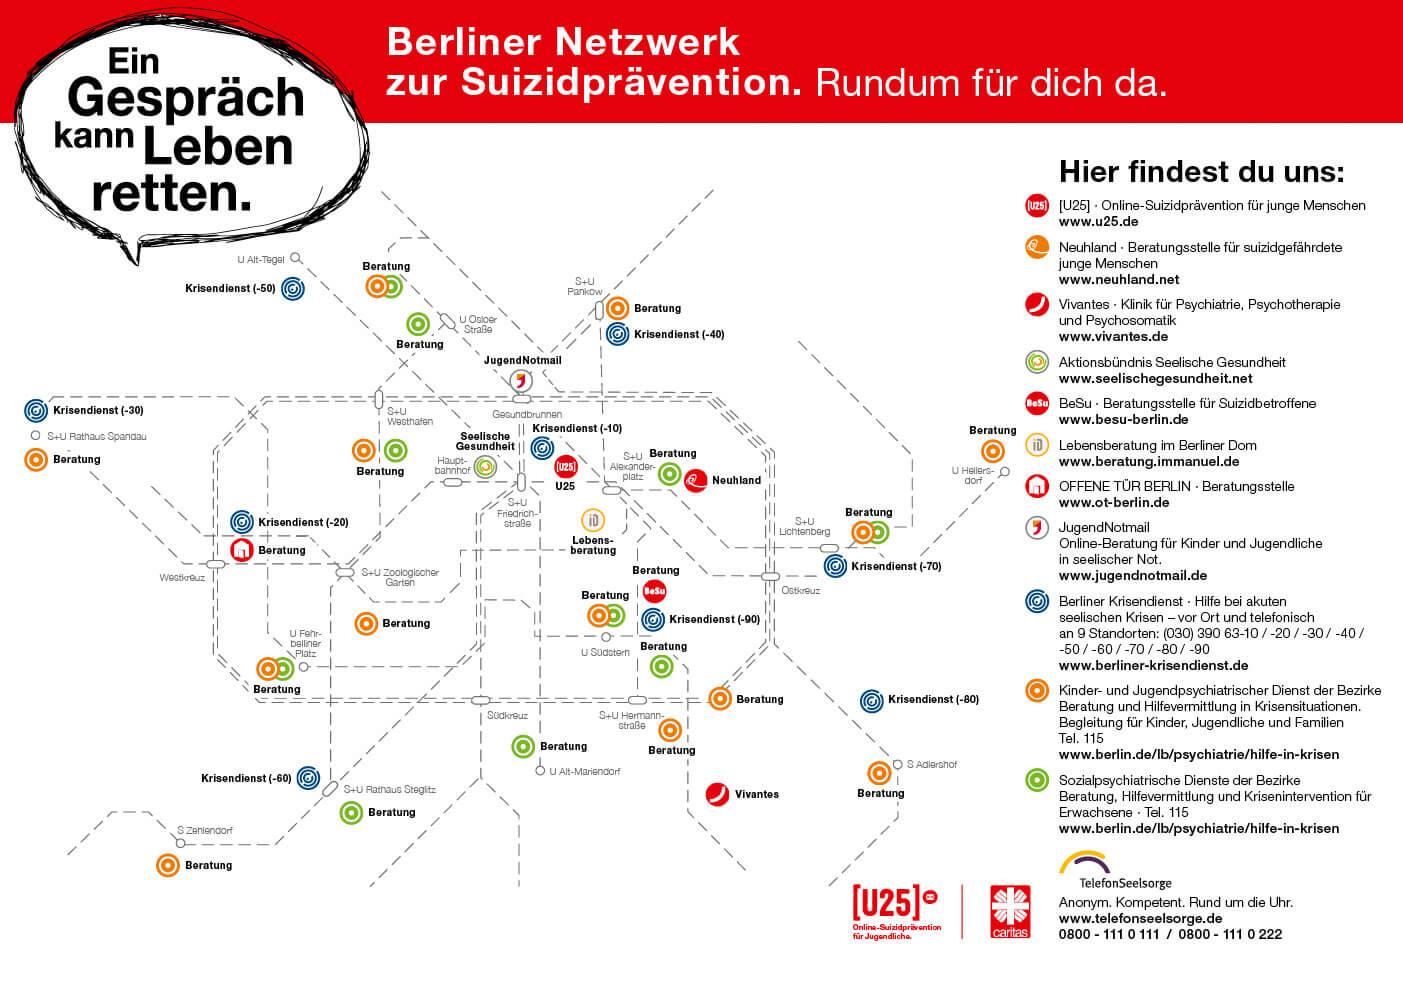 Anlaufstellen Berlin Suizidprävention